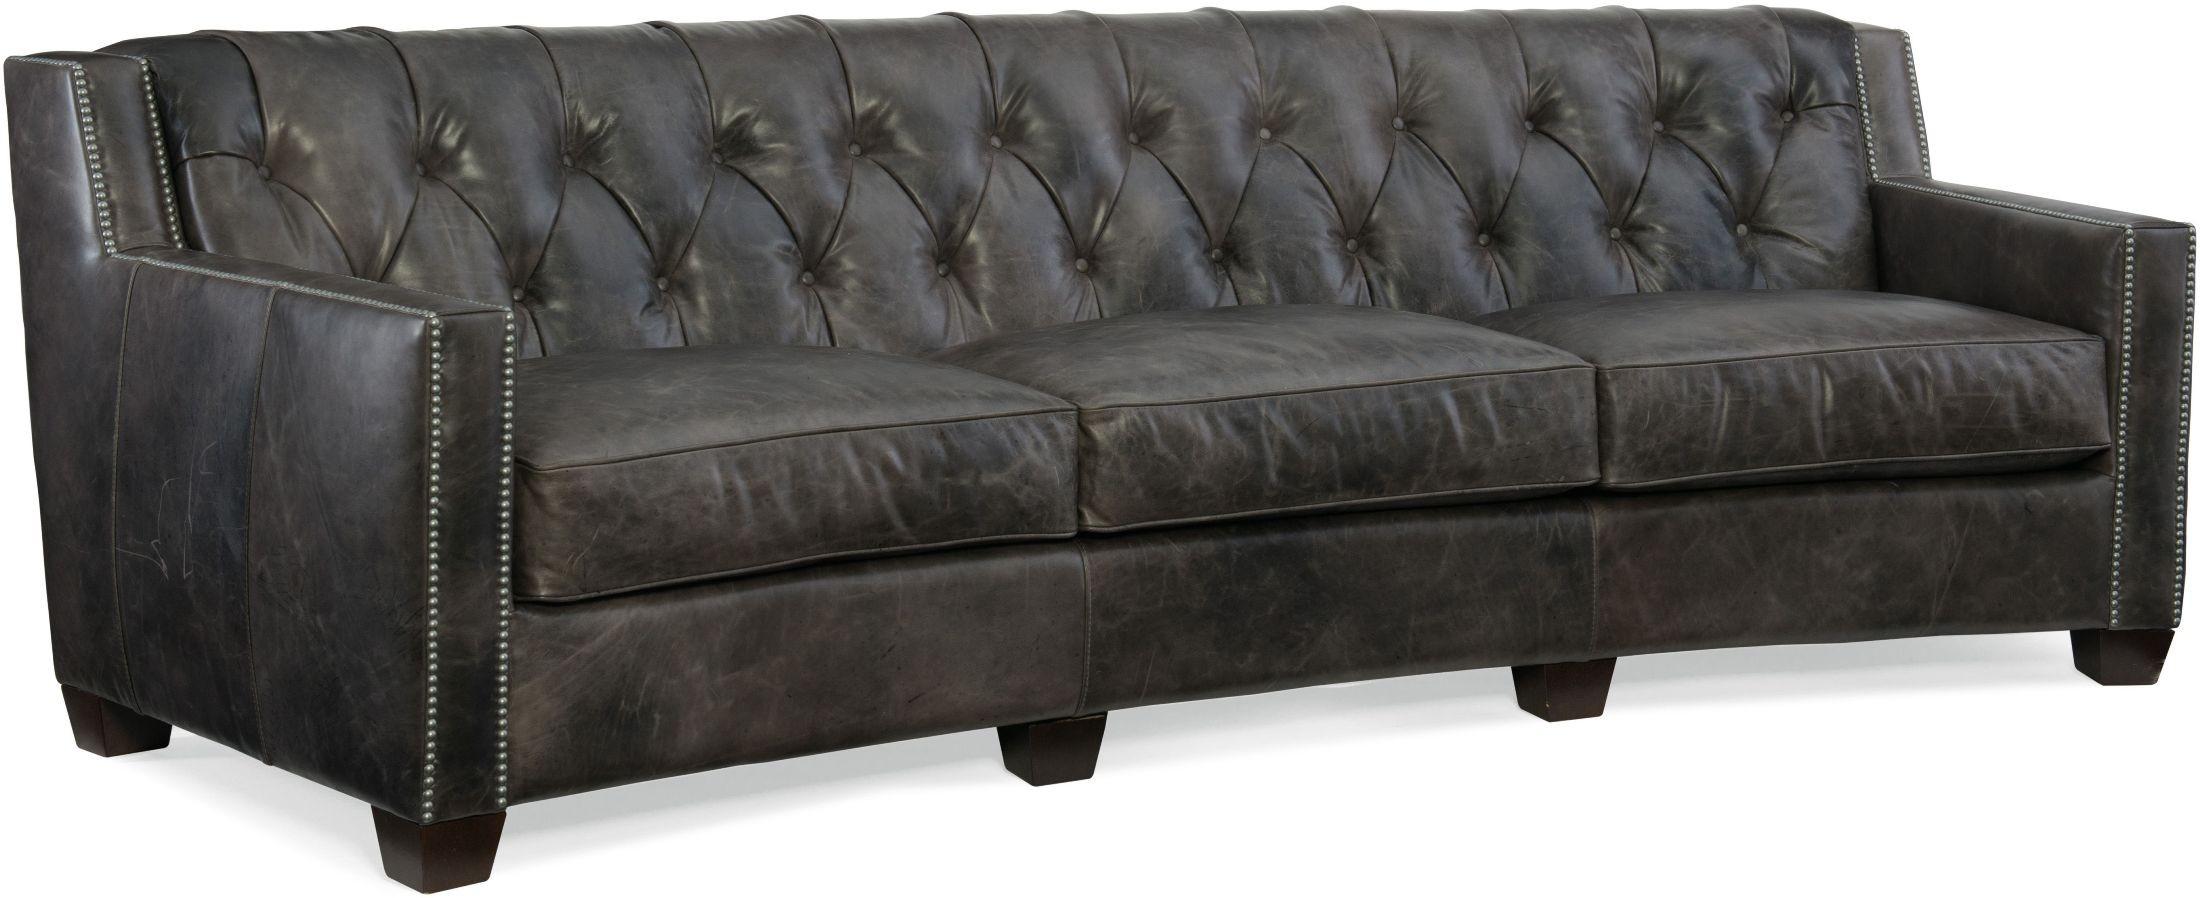 Trellis Gray Leather Sofa